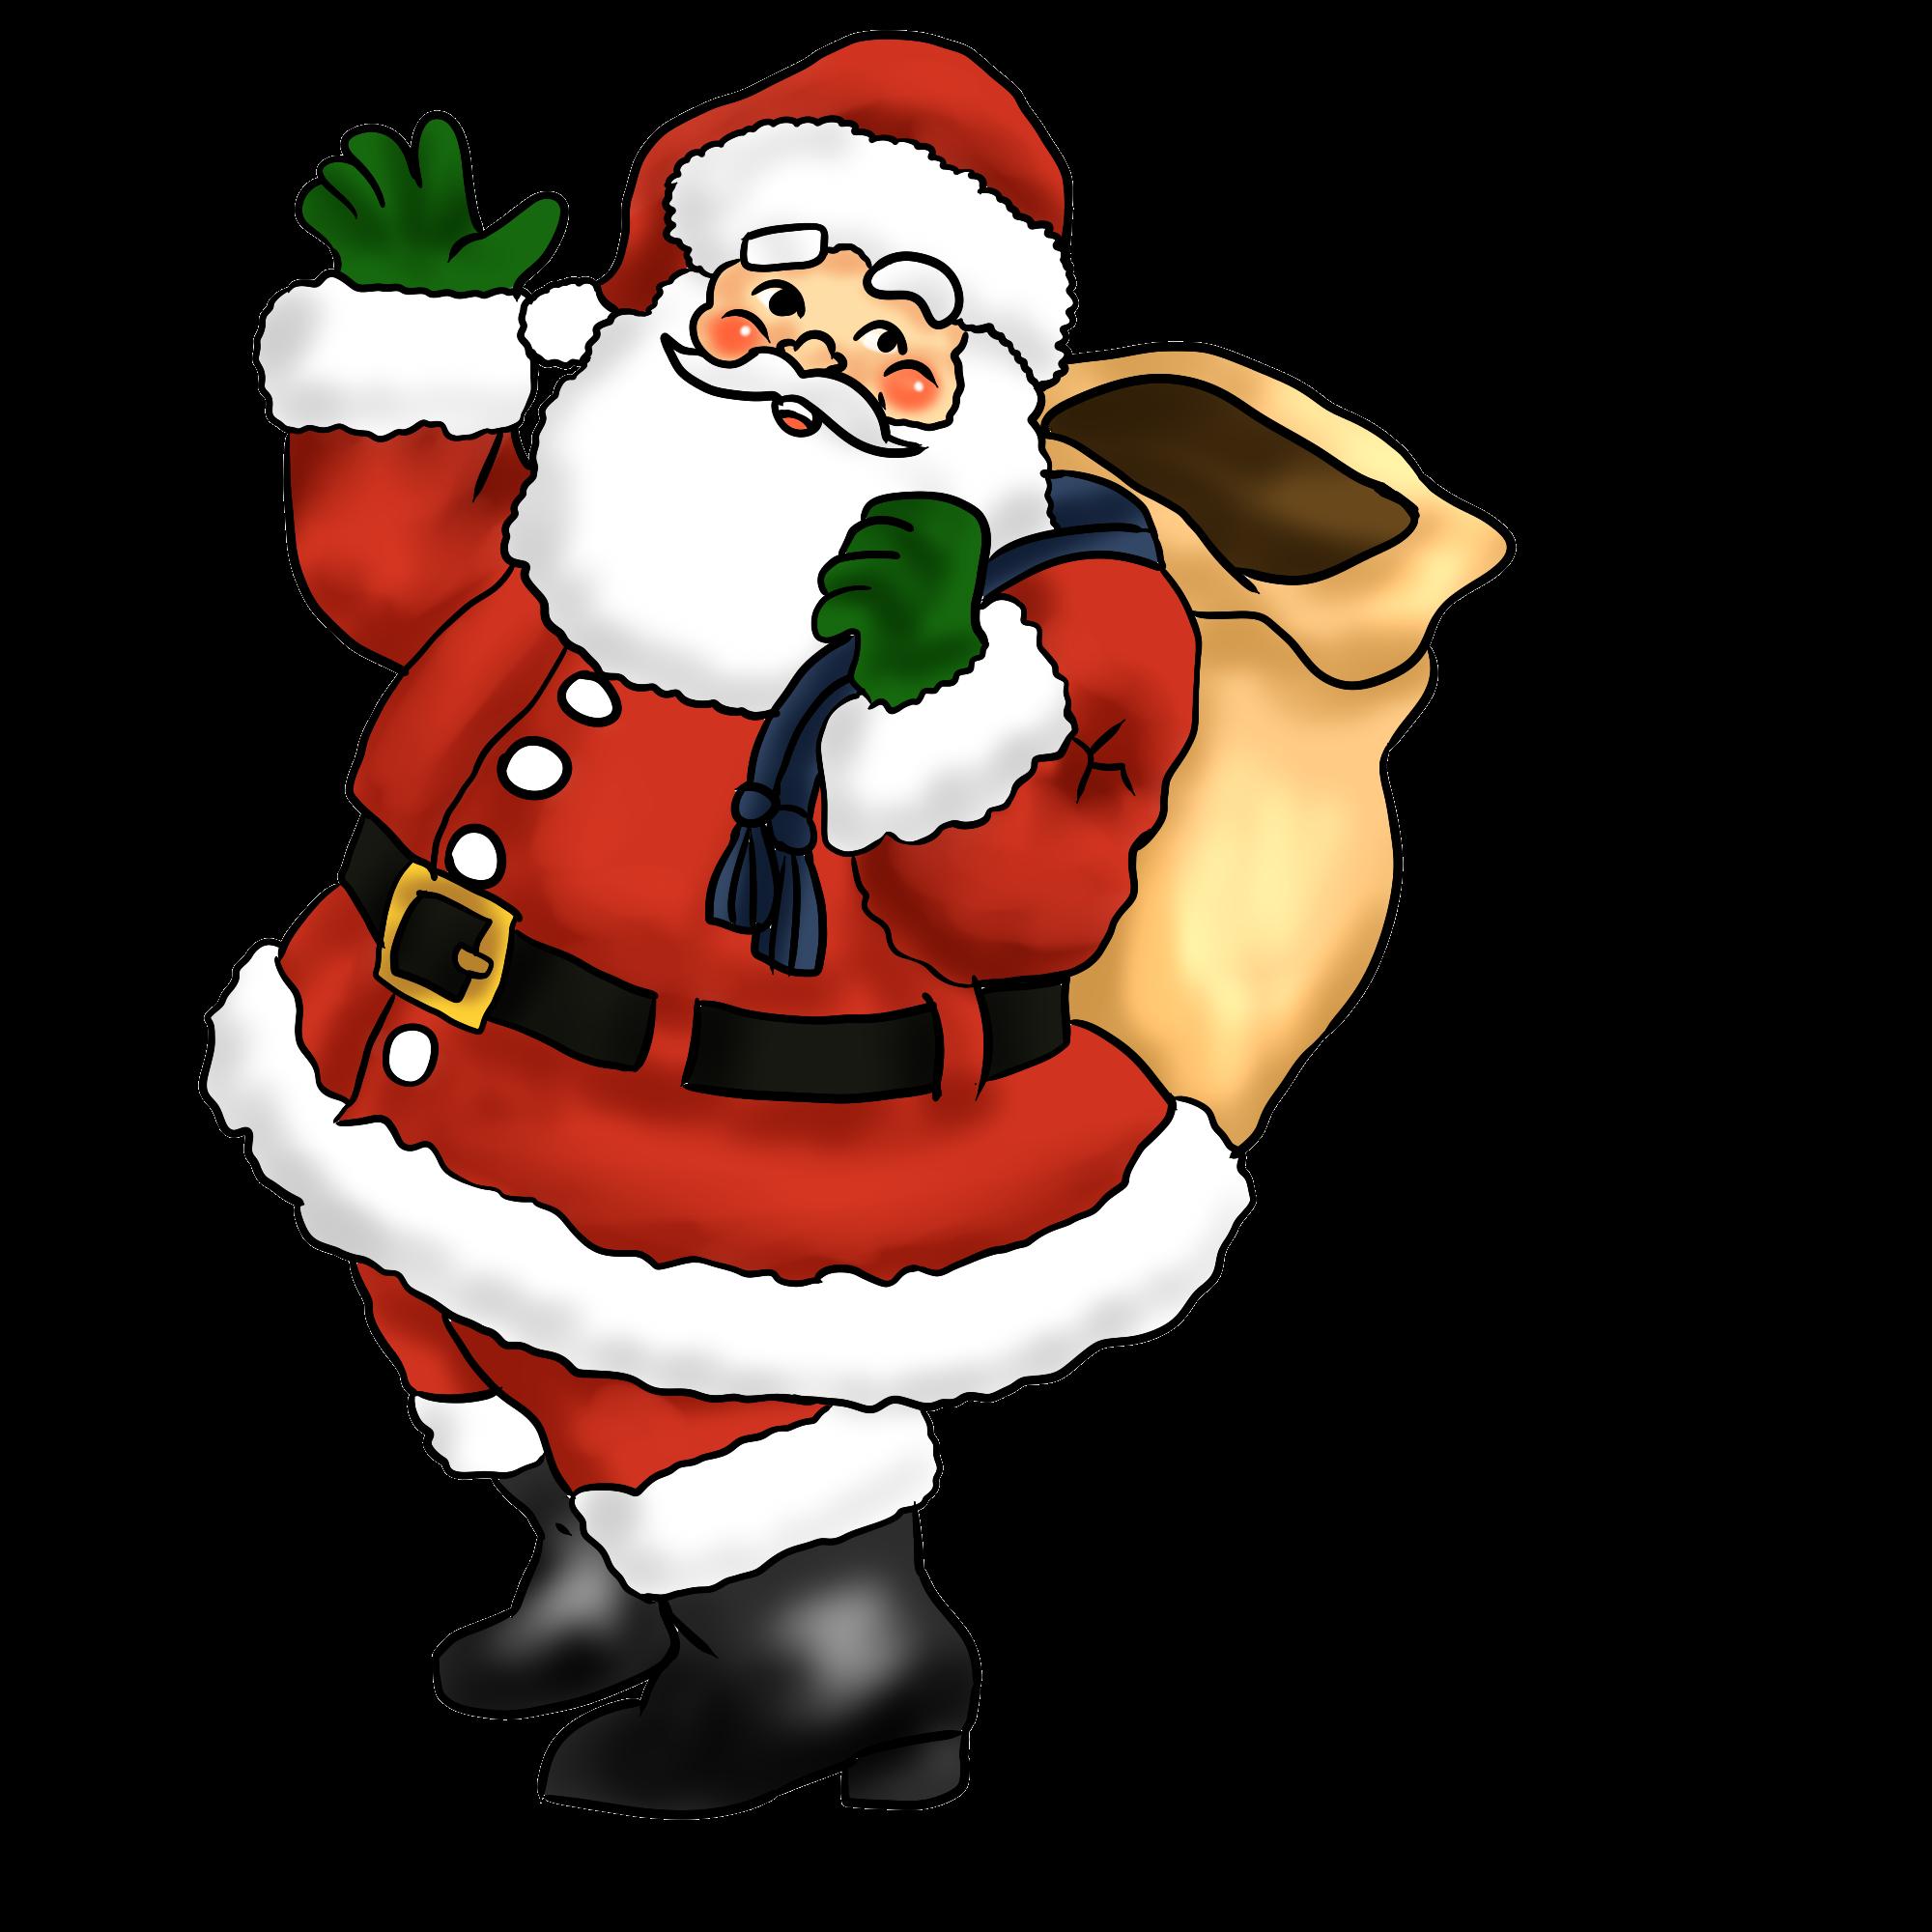 Free Lovely Santa Claus Clip Art-Free Lovely Santa Claus Clip Art-6